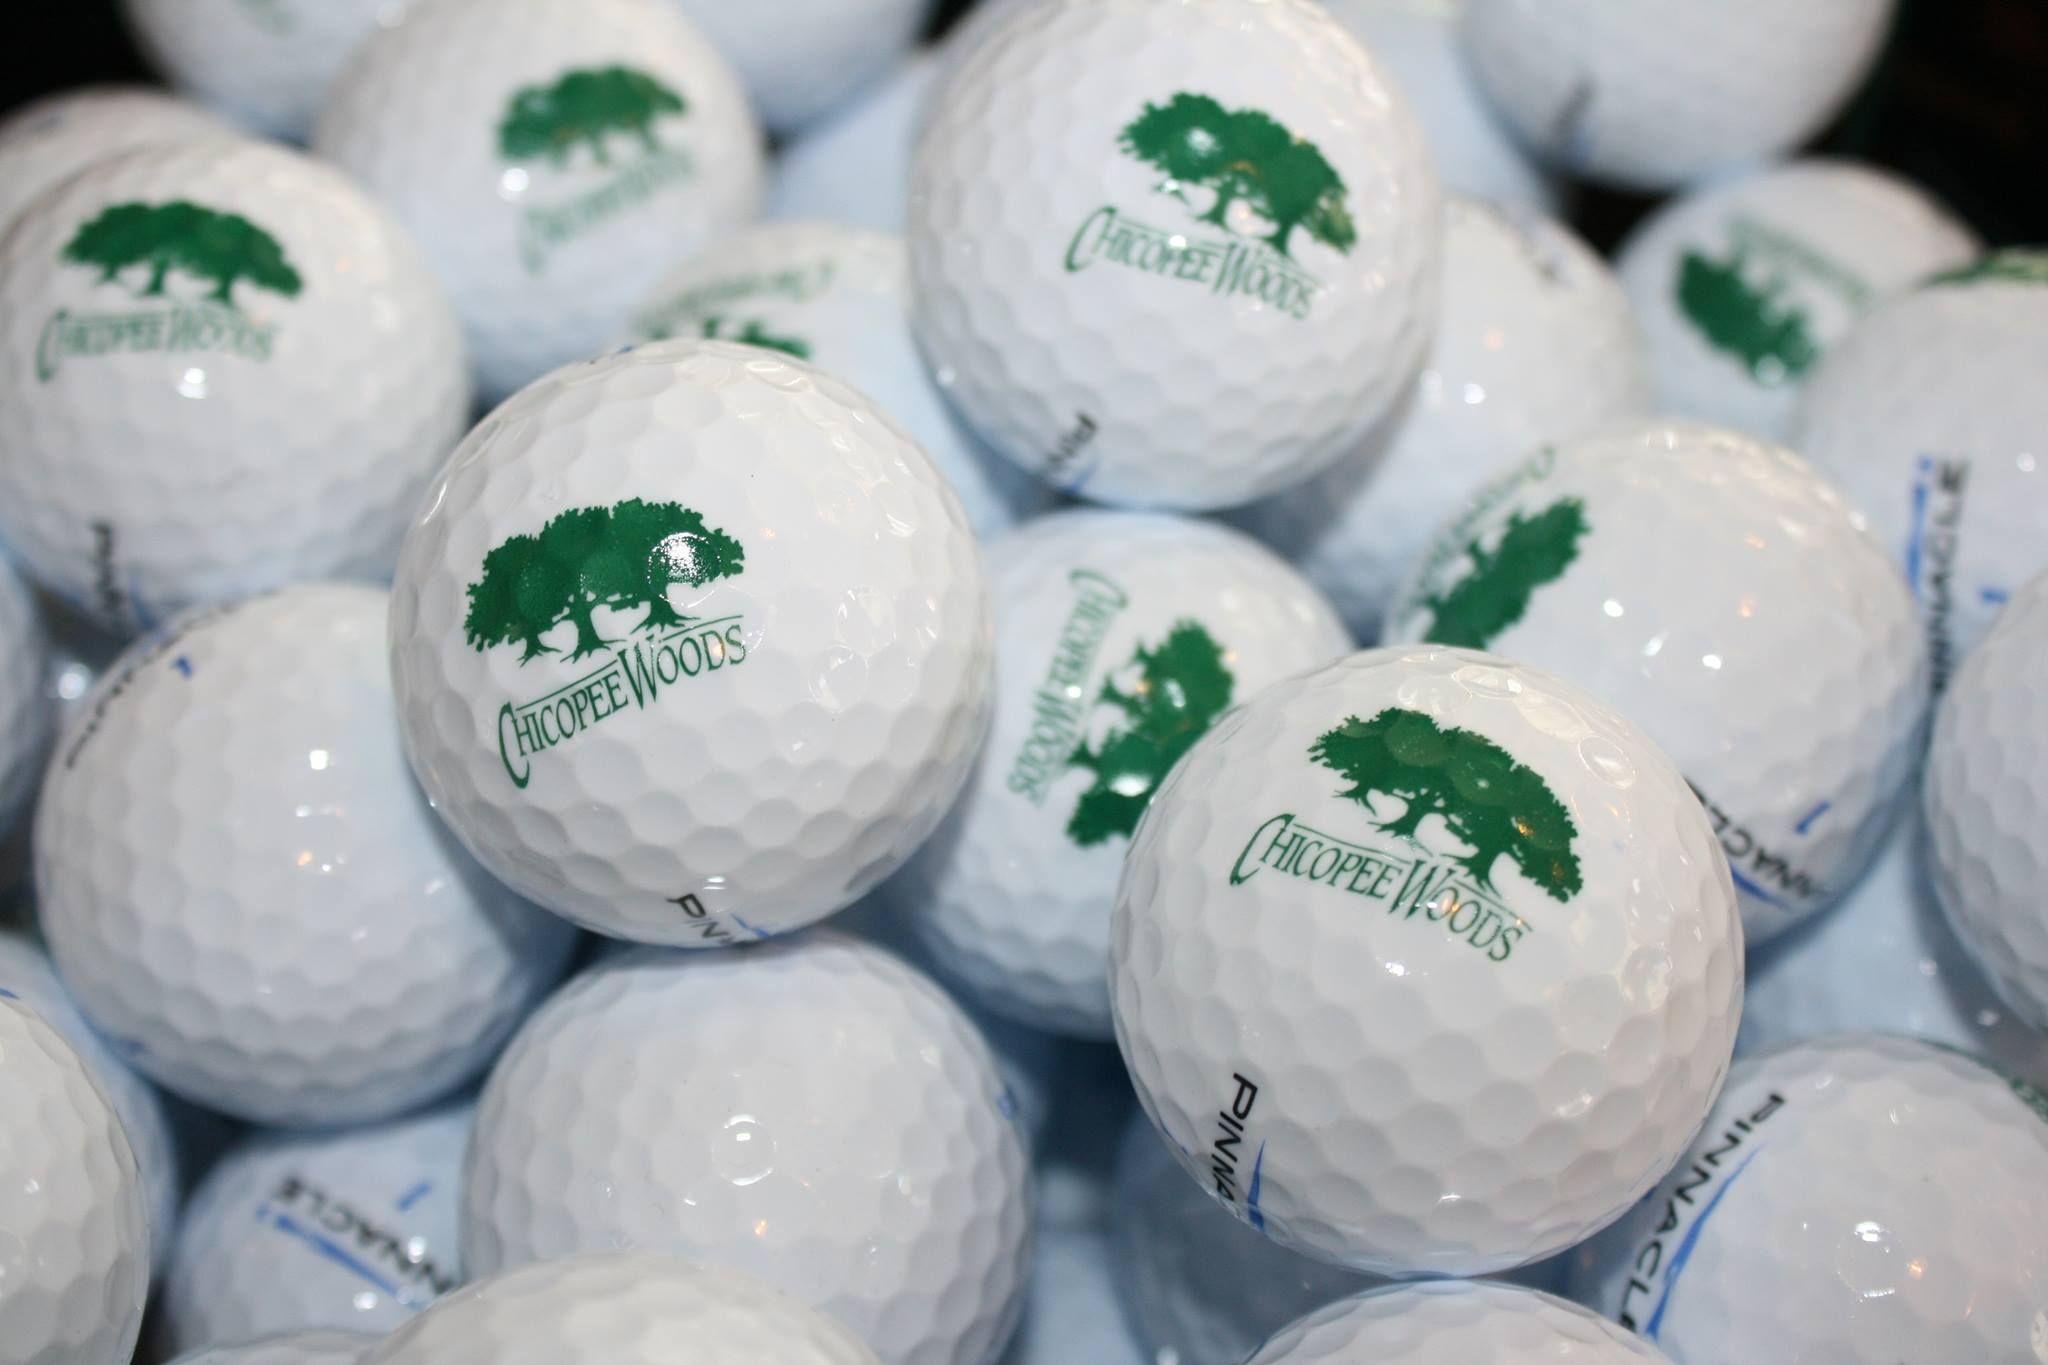 11+ Chicopee golf ga viral